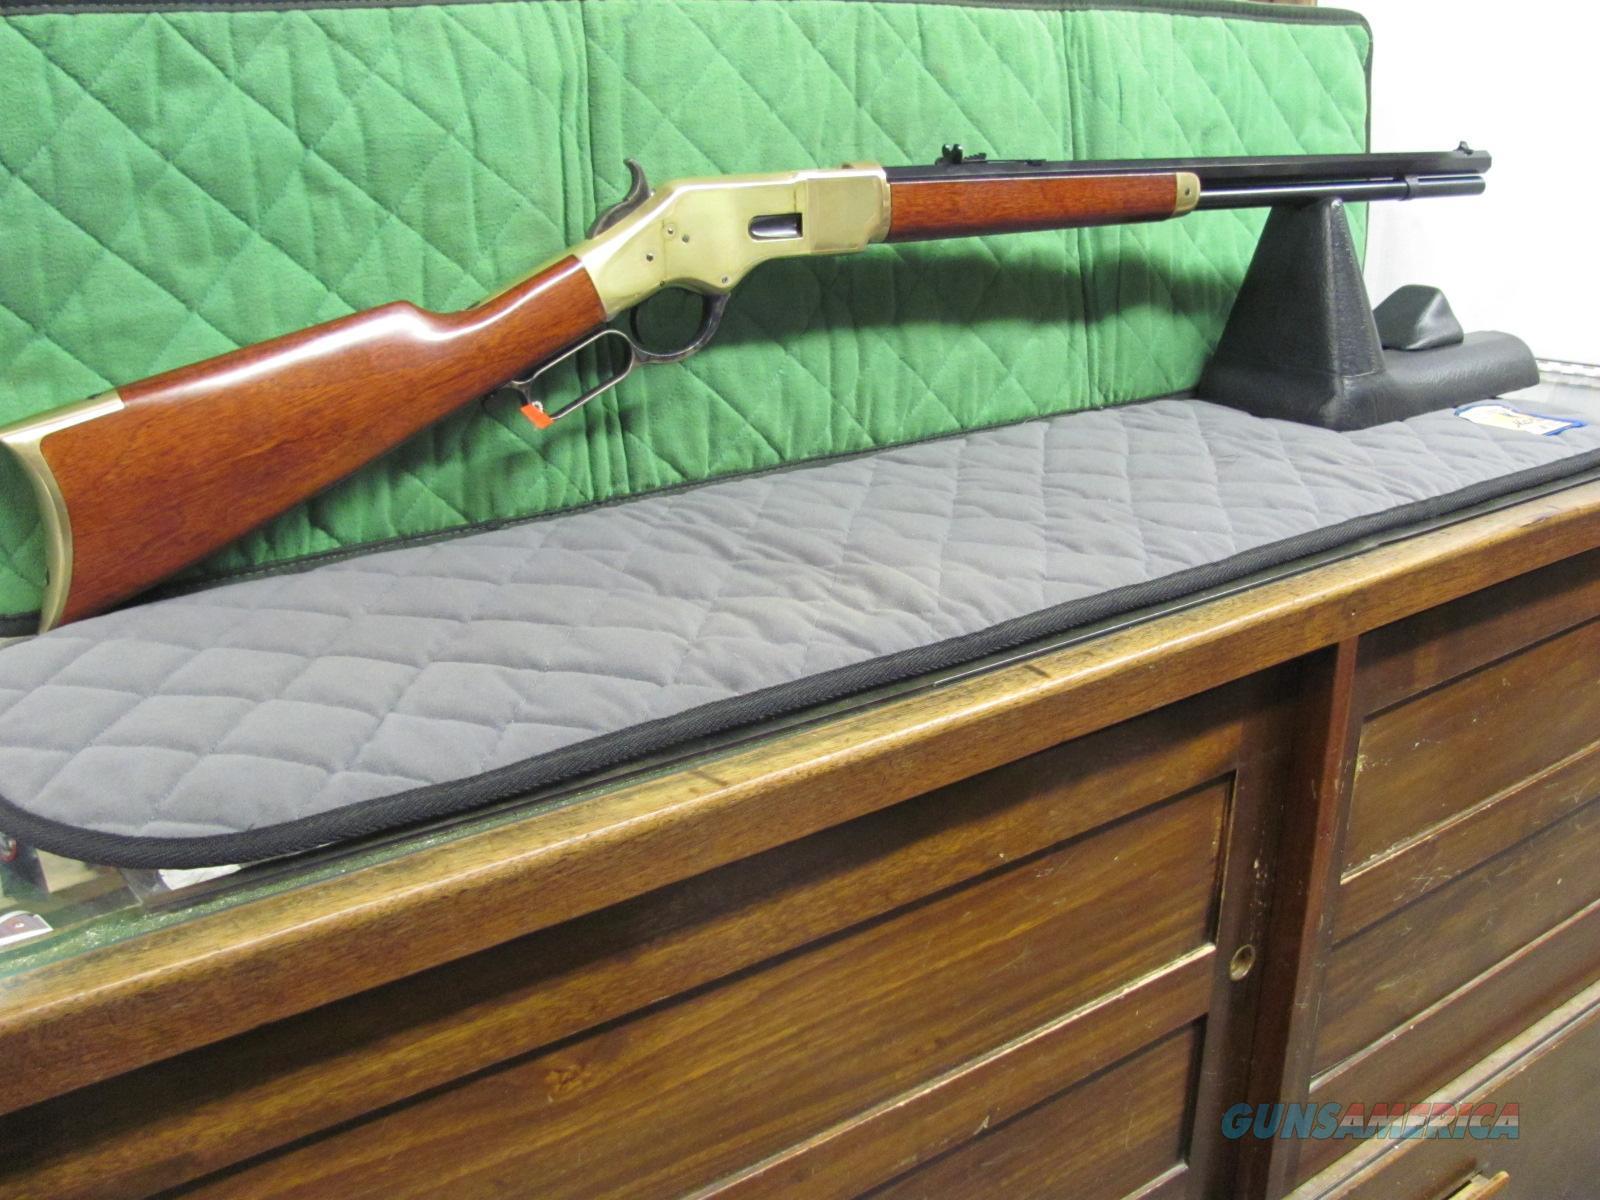 Uberti 1866 Yellowboy Sporting Rifle 45 Long Colt  **NEW**  Guns > Rifles > Uberti Rifles > Lever Action